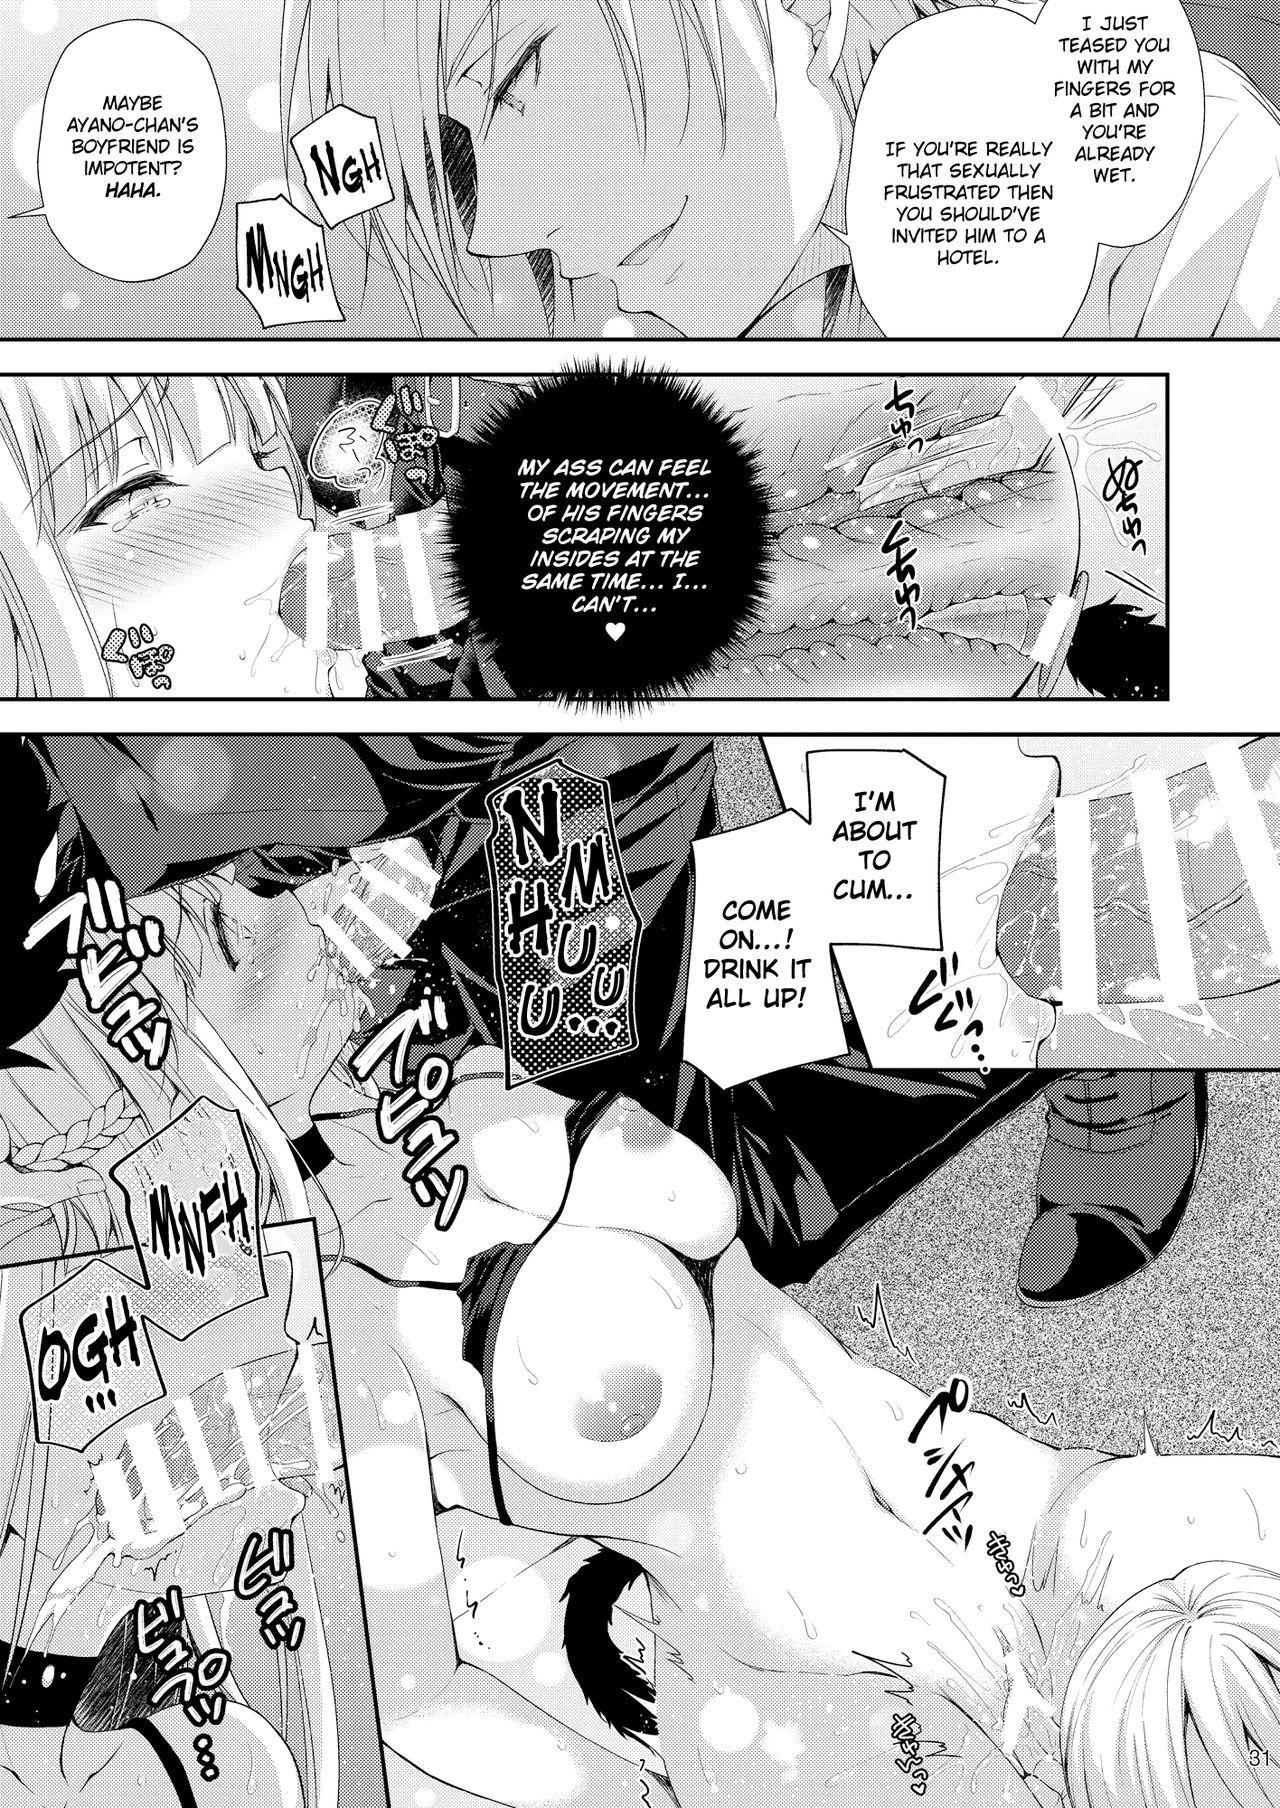 (C96) [Sugar*Berry*Syrup (Crowe)] Indeki no Reijou 3 ~Yureugoku Kokoro, Yoru Midareru Mitsubana~ | Obscene Lady 3 - ~Wavering heart, Astrayed Evening Nectar~ [English] [obsoletezero] 30